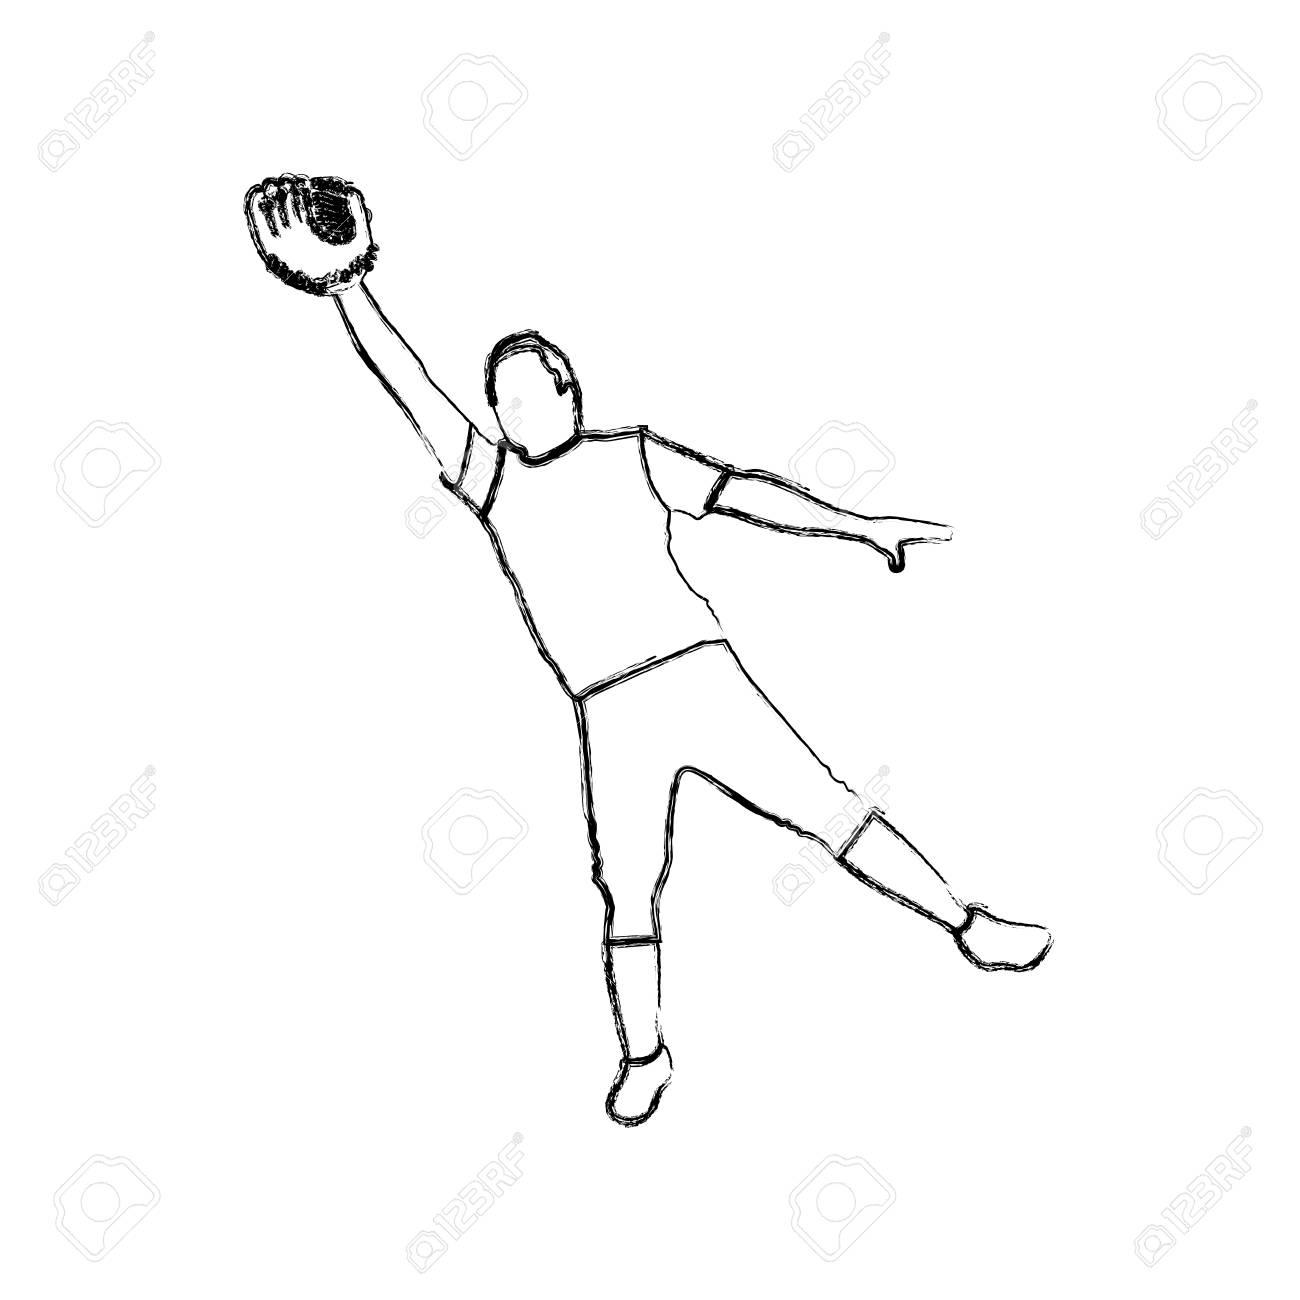 Monochrome Sketch Of Baseball Catcher Vector Illustration Royalty